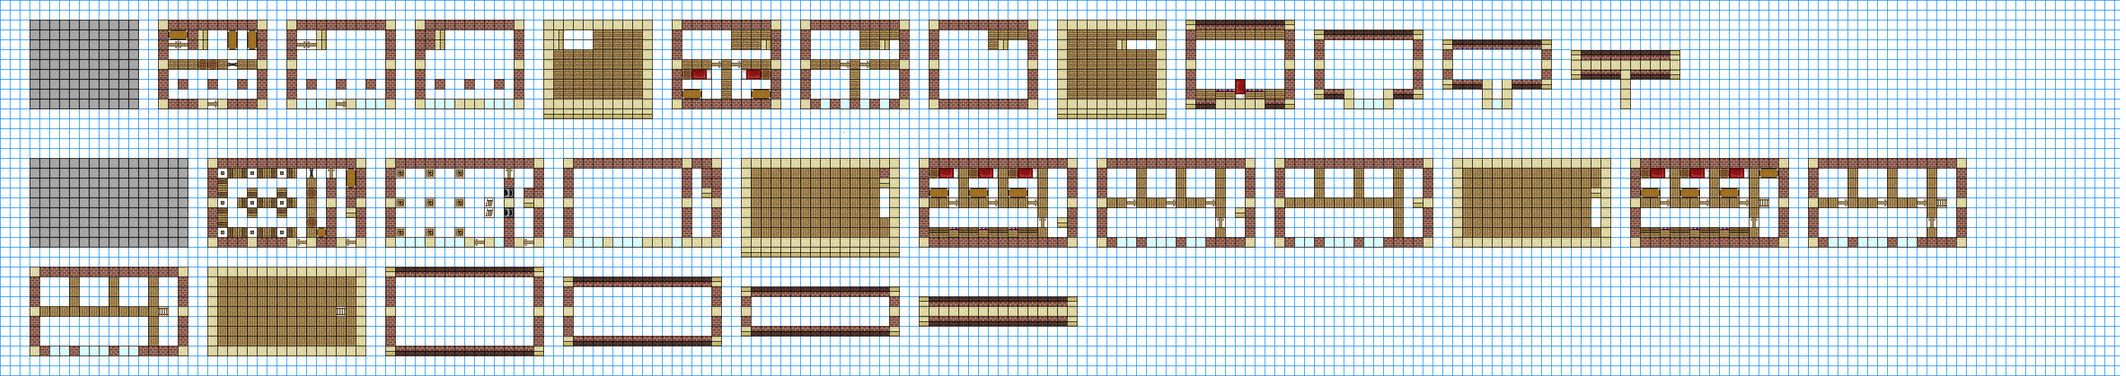 Npc village buildings by coltcoyote on deviantart apps directories - Minecraft Blueprints